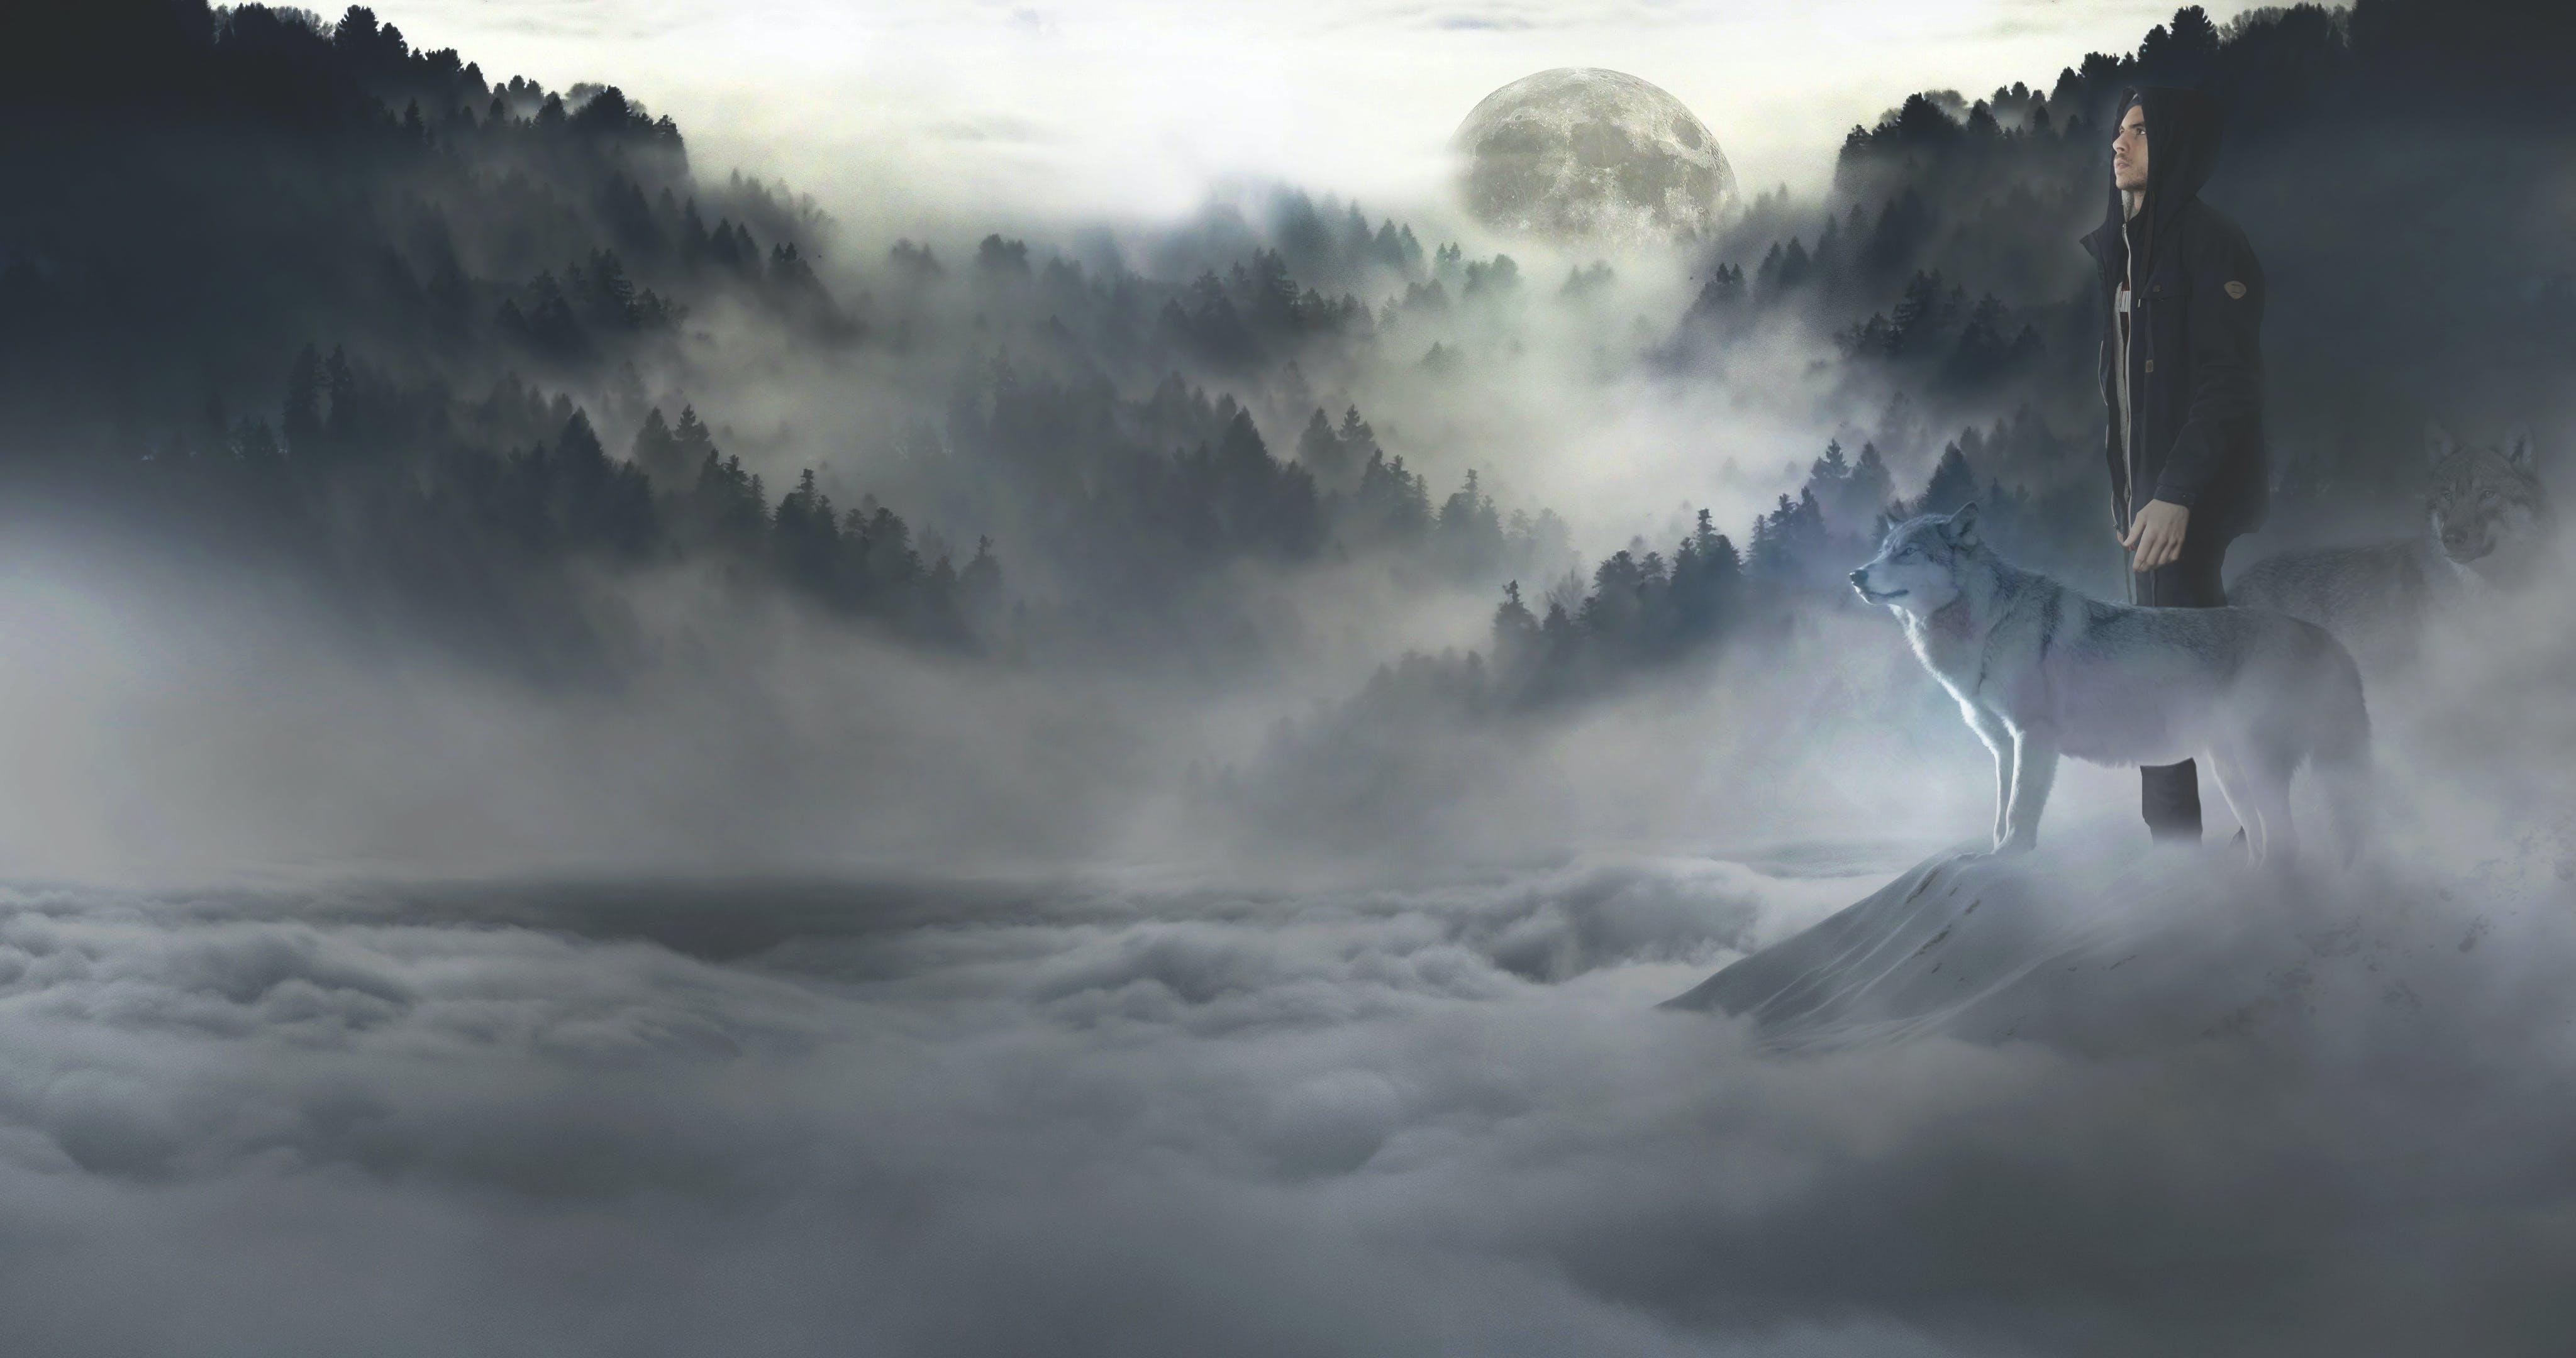 Free stock photo of Adobe Photoshop, adventure, fog, gray sky